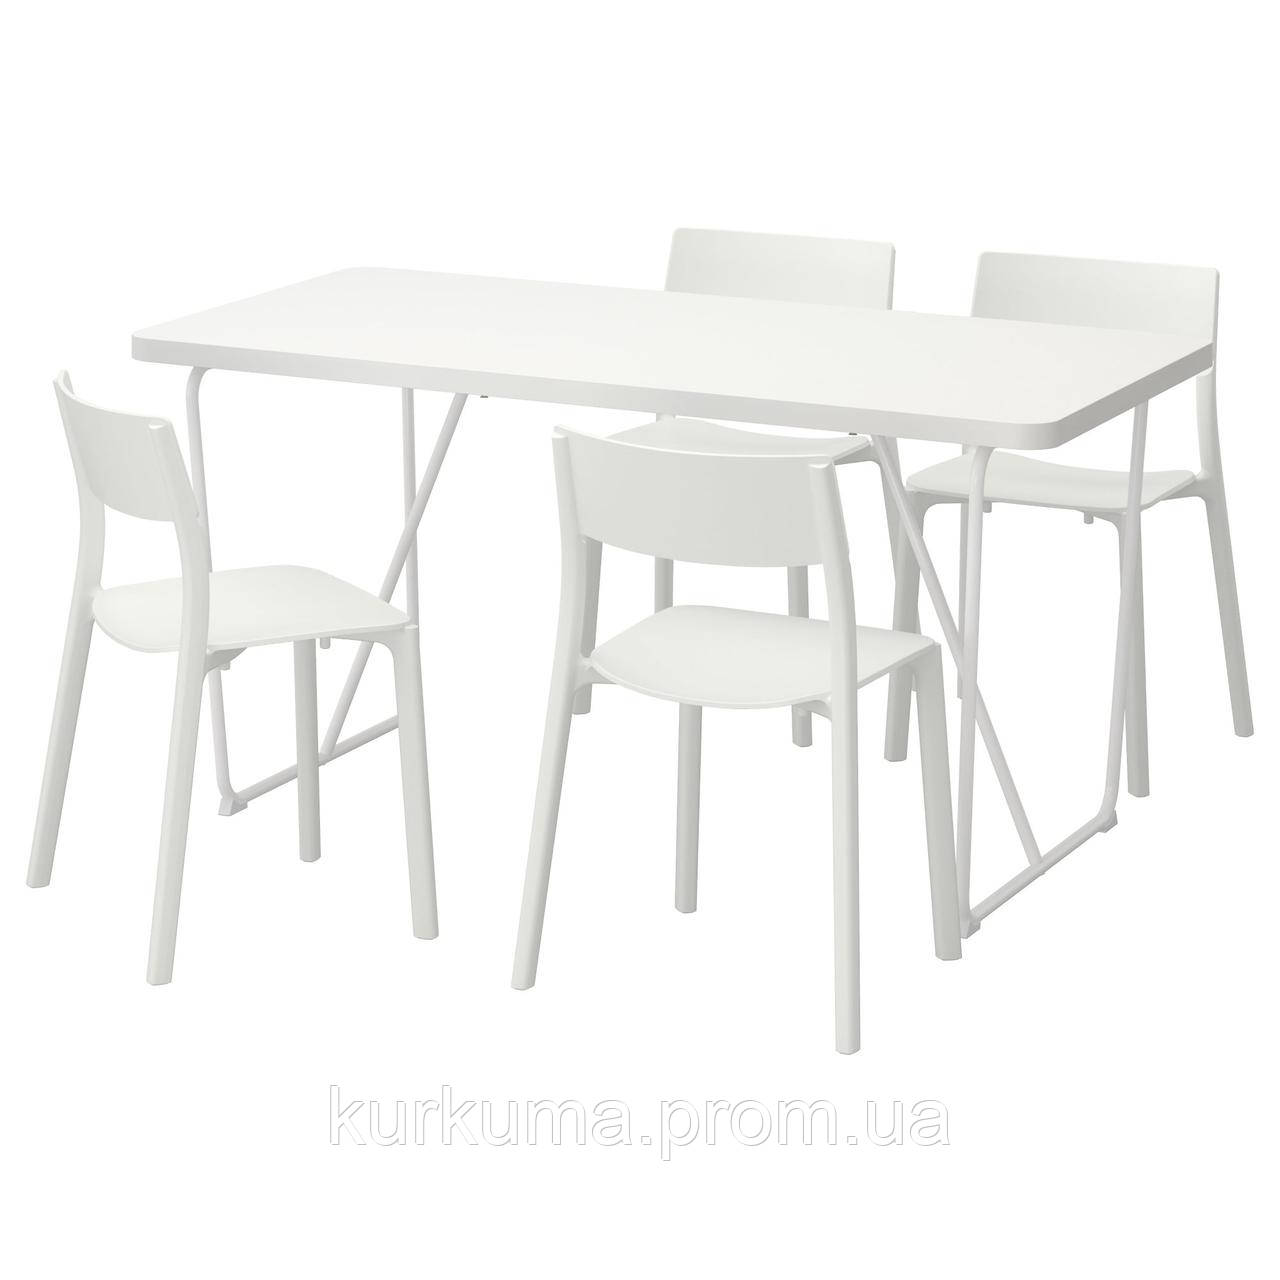 IKEA RYDEBACK/BACKARYD/JANINGE Стол и 4 стула, белый, белый  (691.615.52)